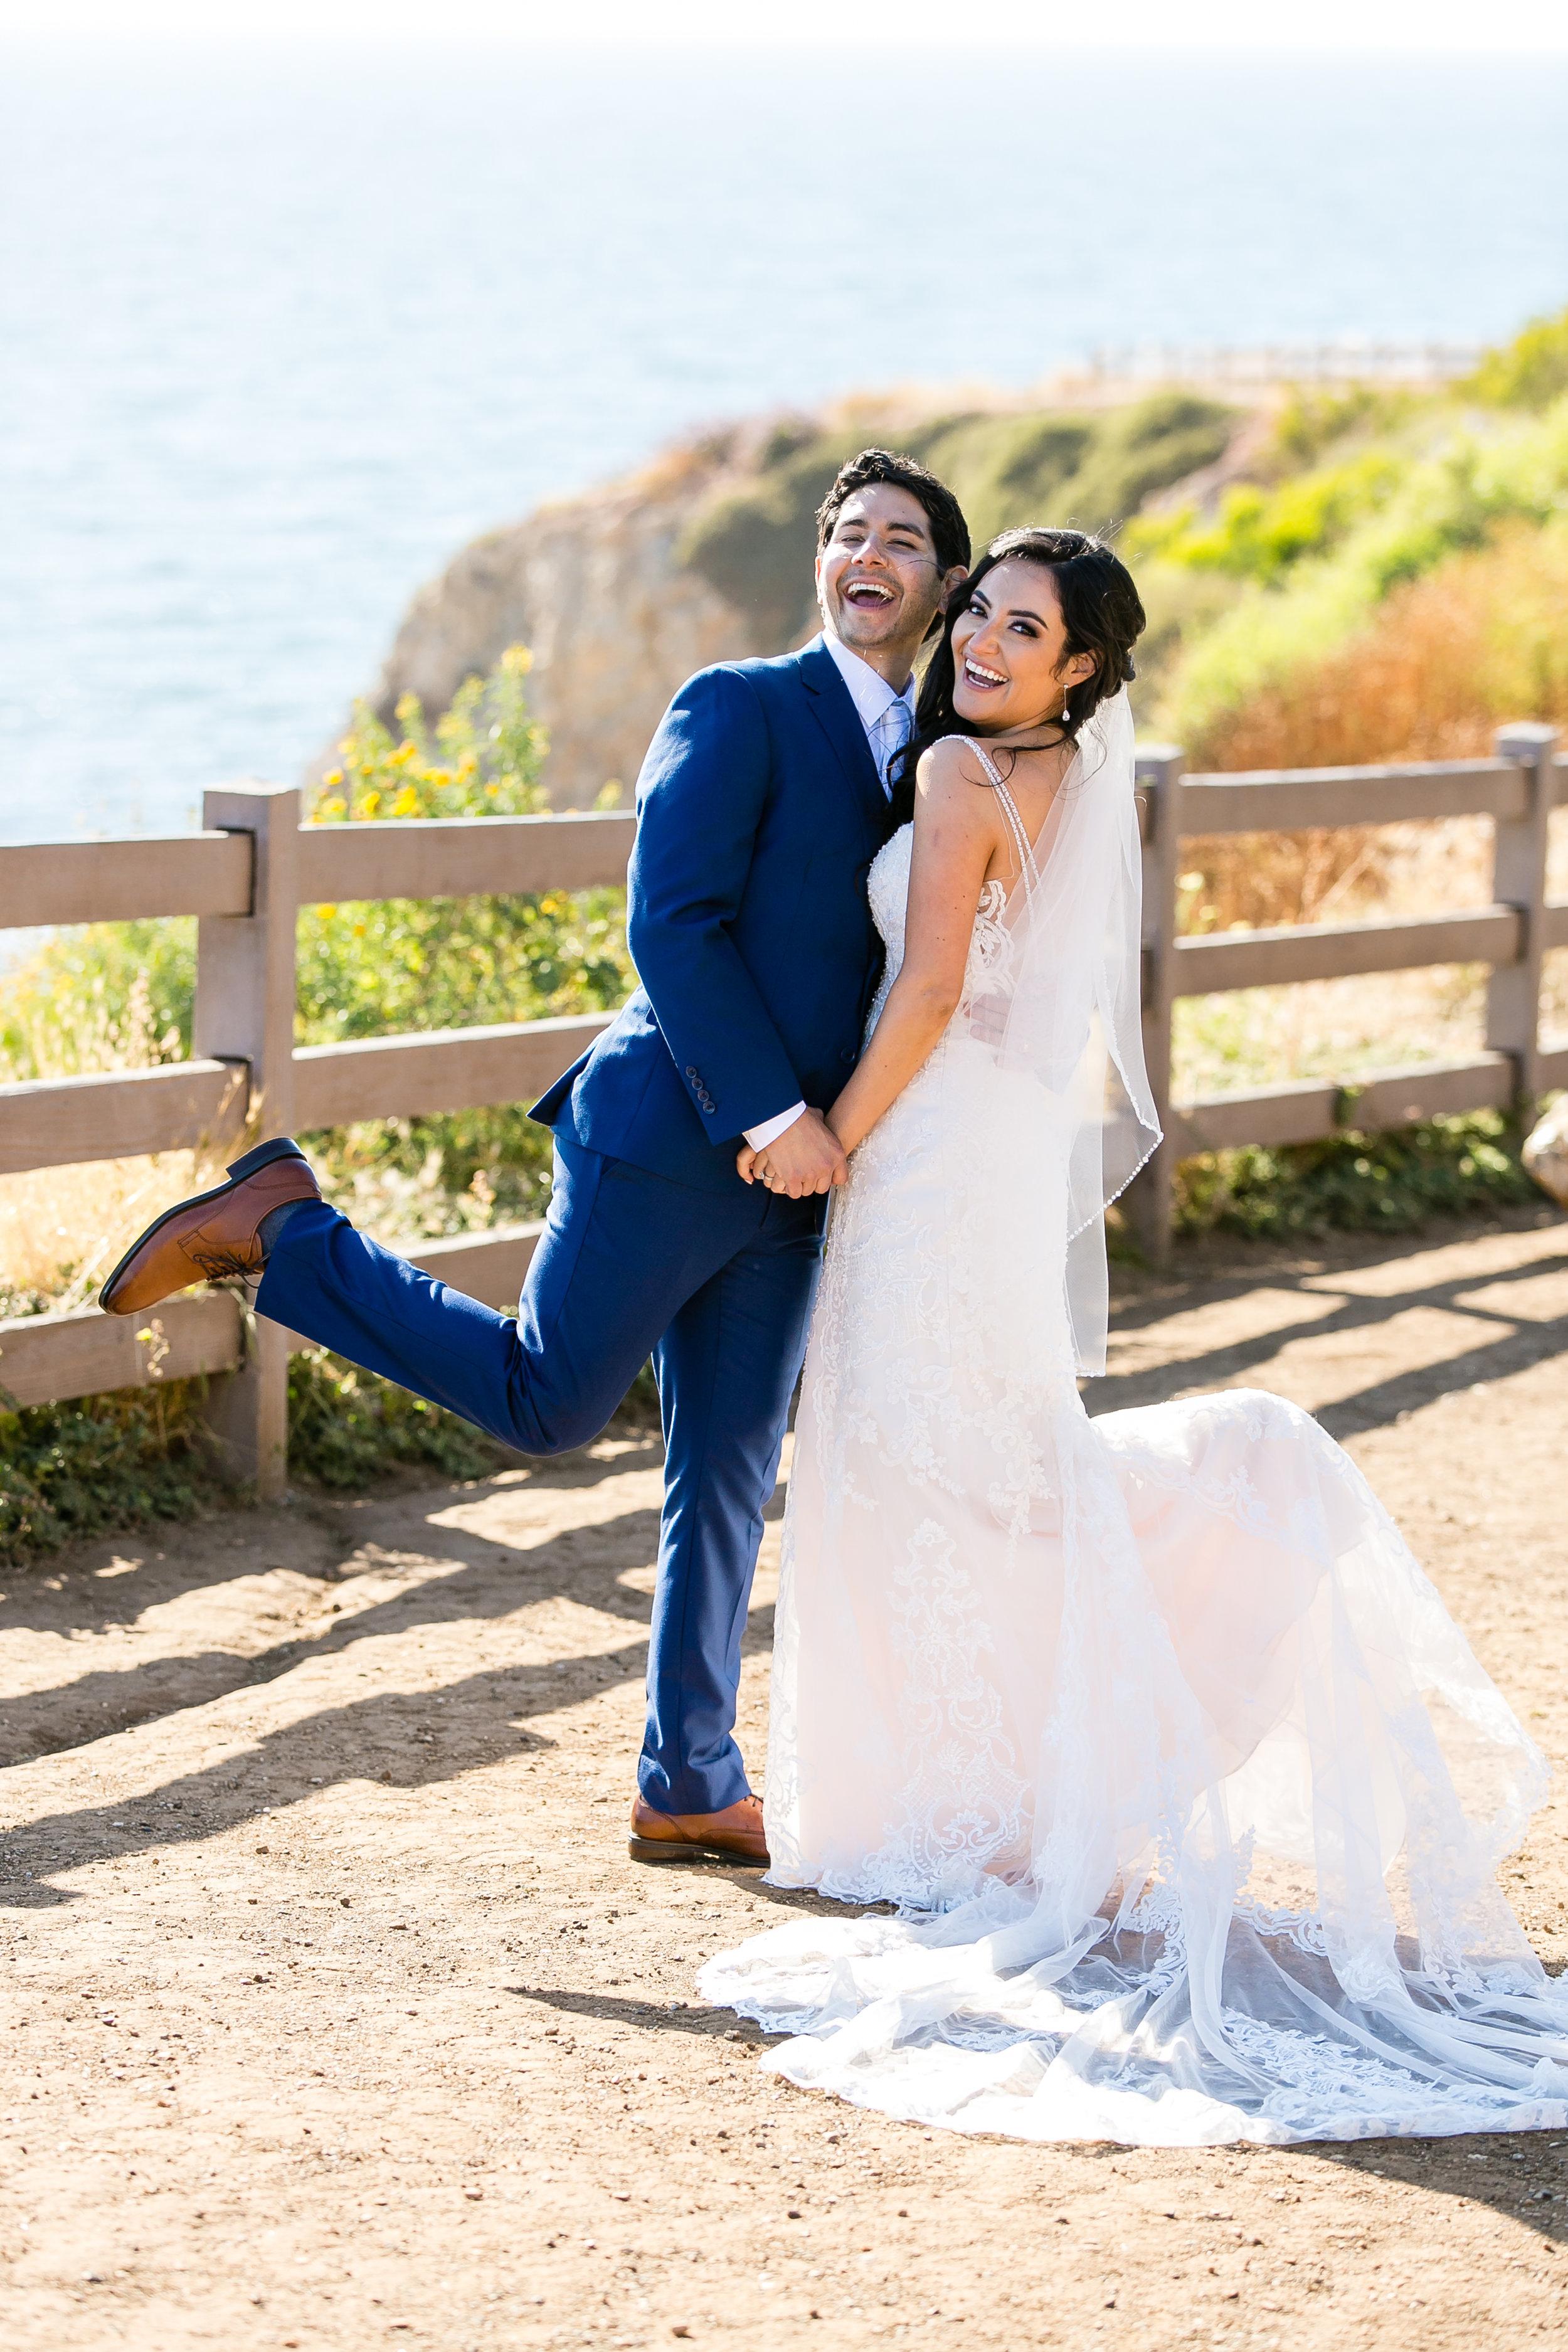 2019_05_24_Wedding_Barajas_0706.jpg